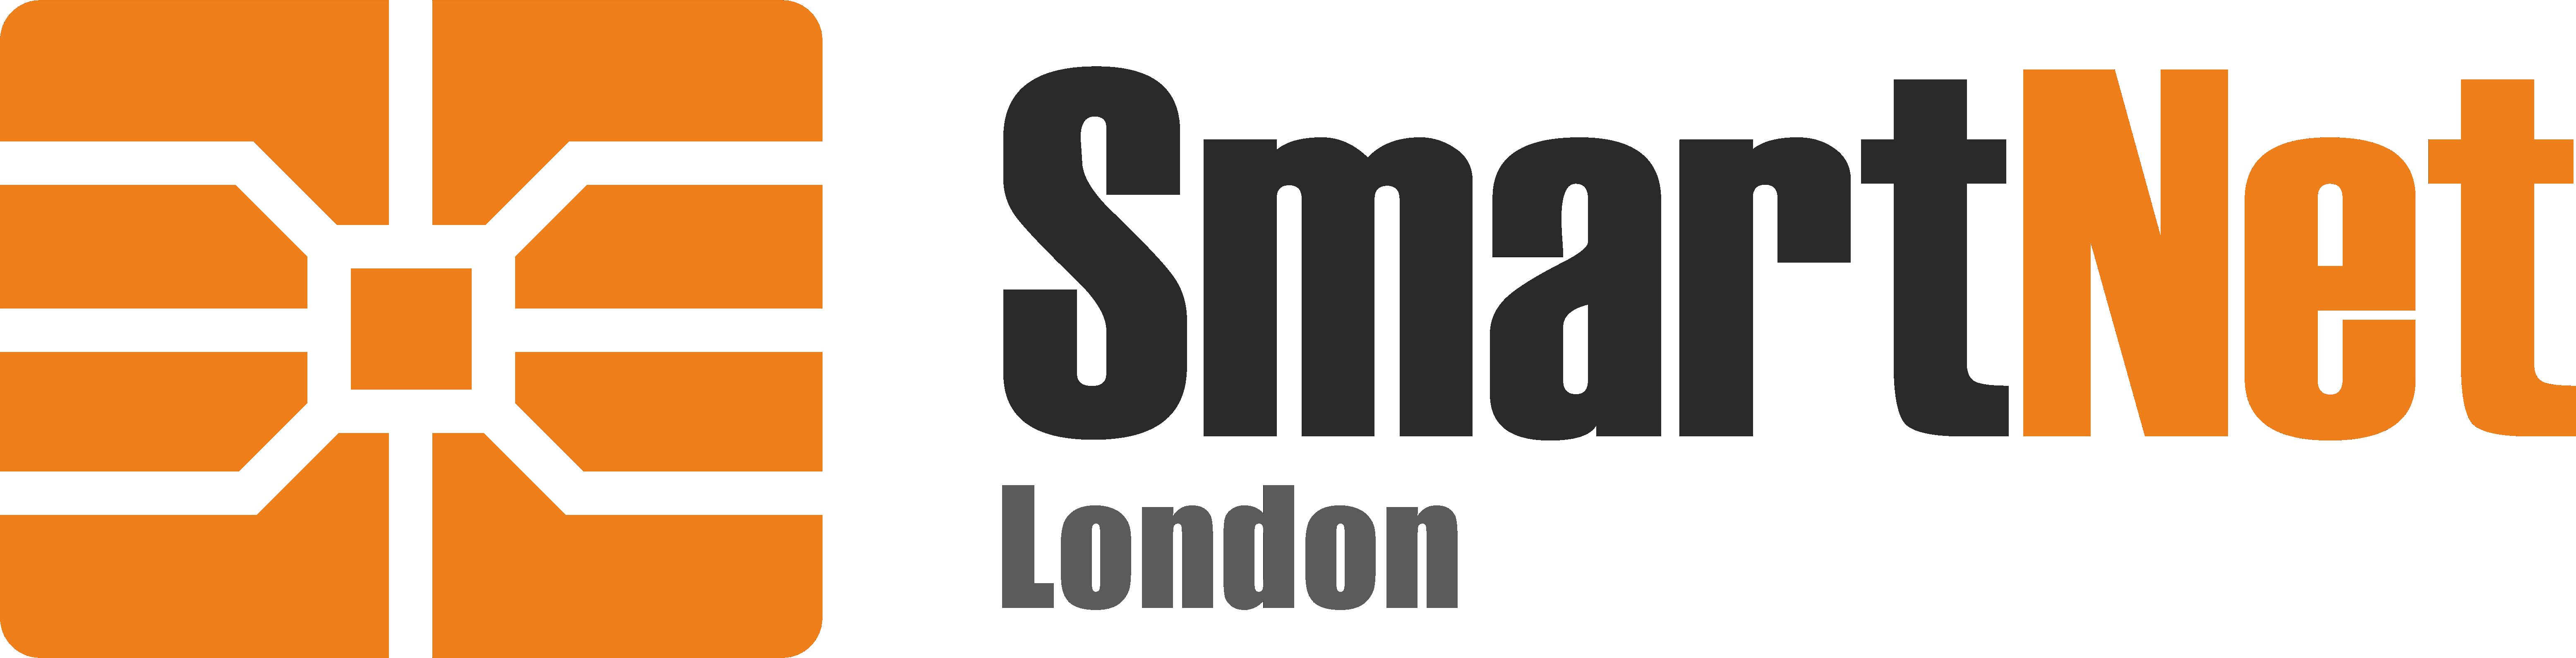 SmartNet Solution